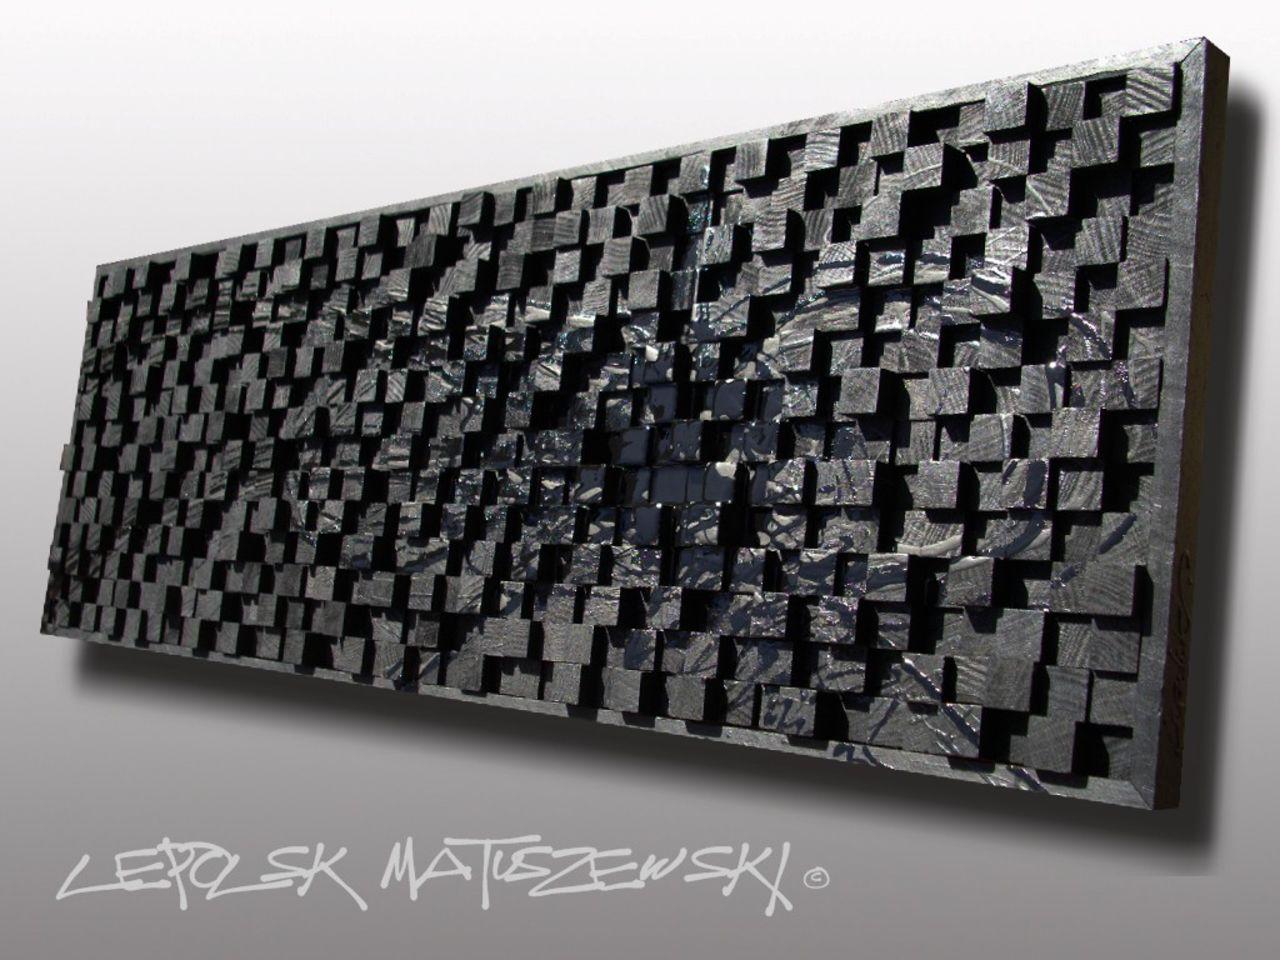 MK  Lepolsk Matuszewski PROTOTYPE 616³ expressionnisme abstrait